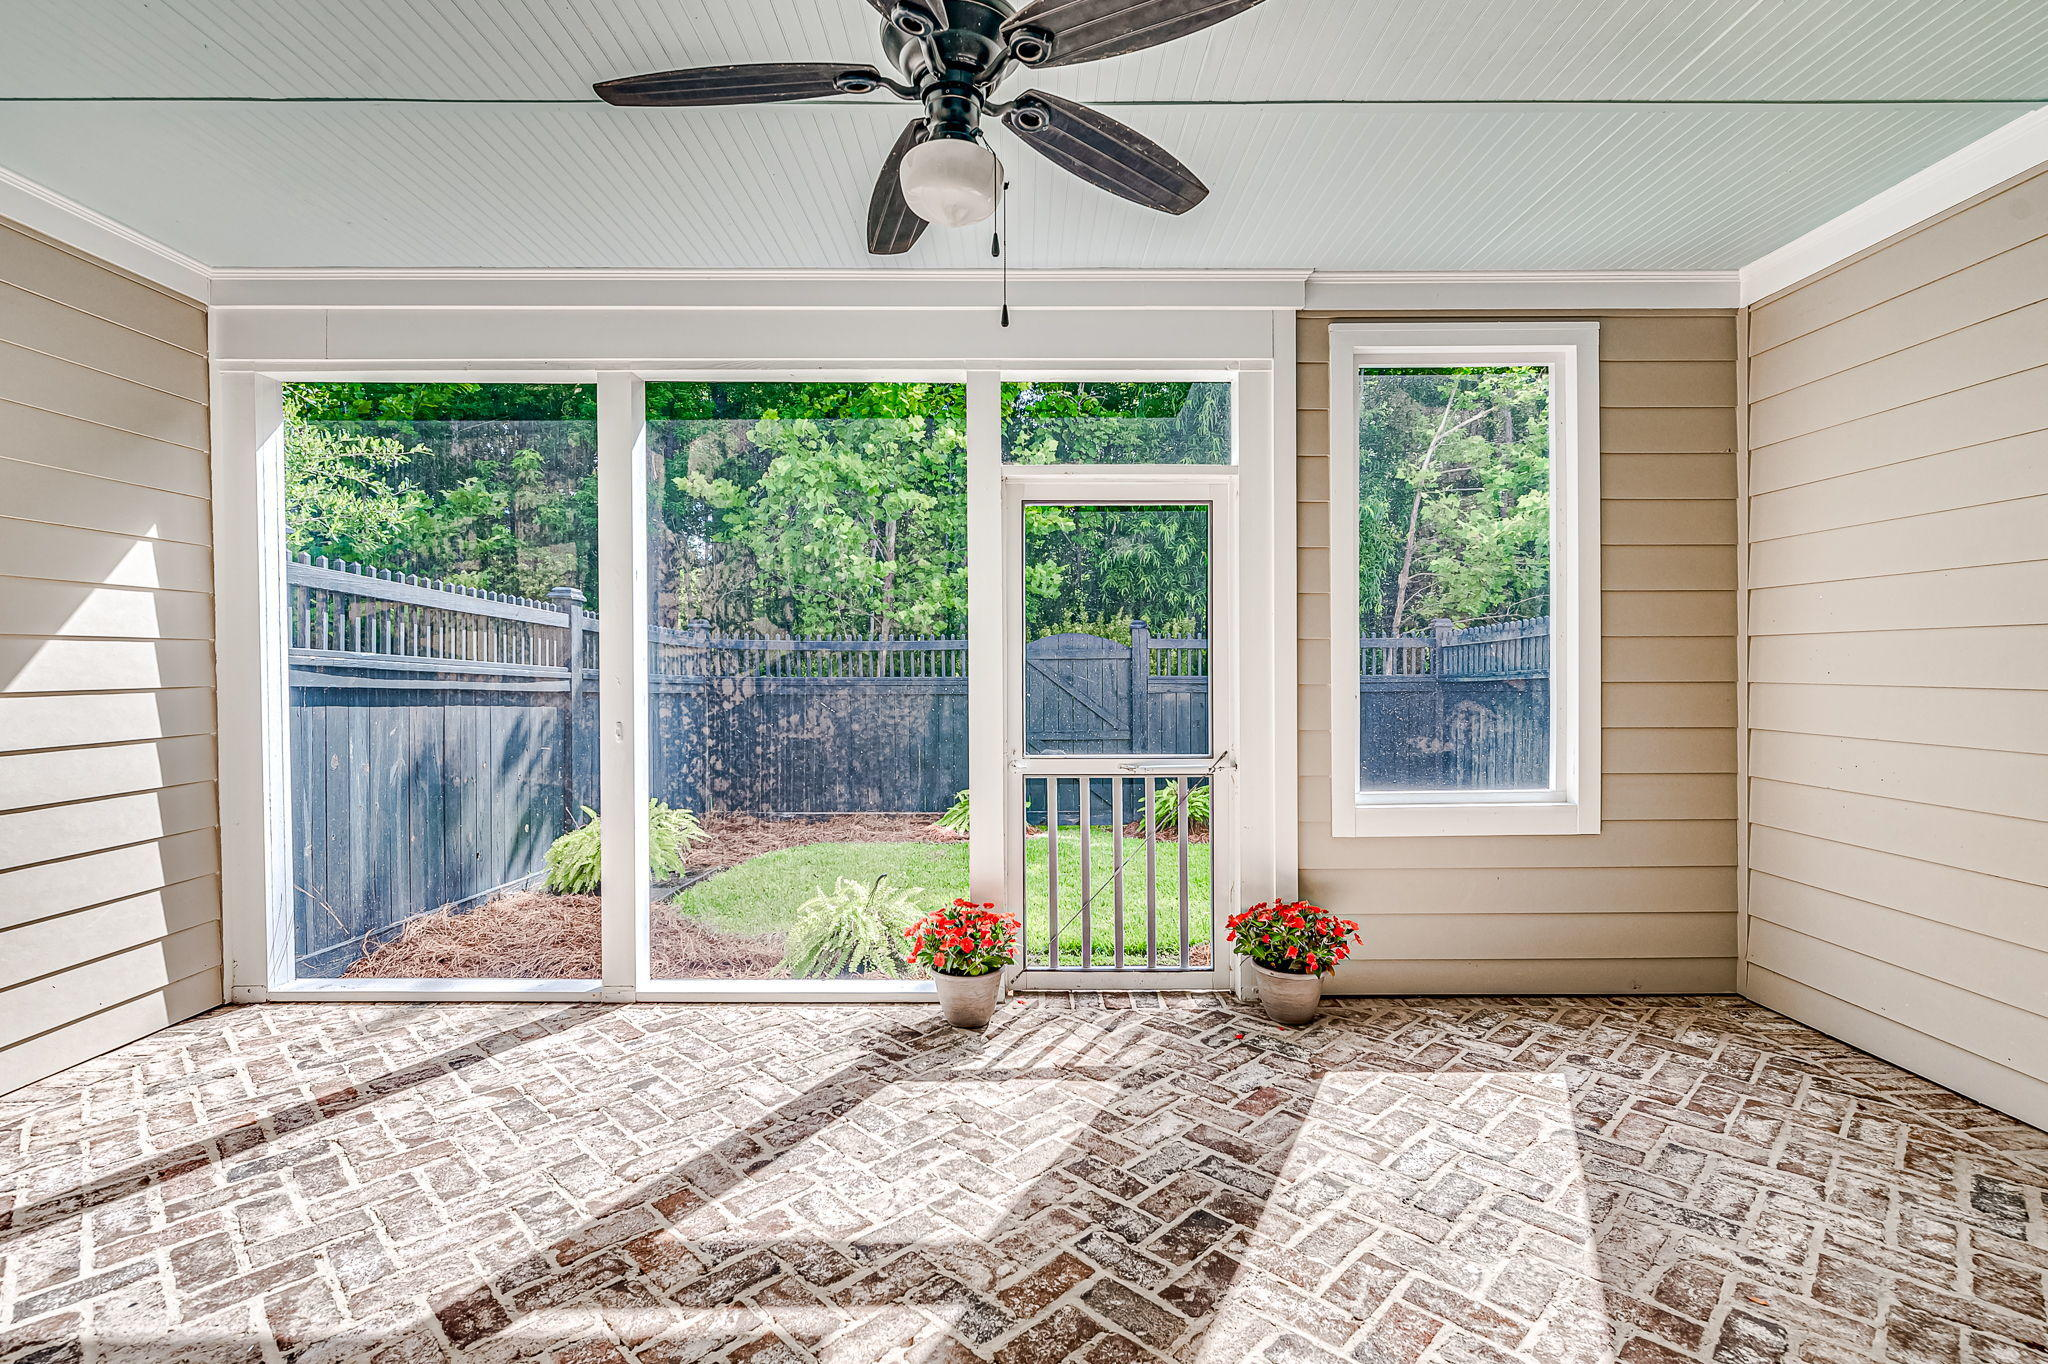 Dunes West Homes For Sale - 2476 Kings Gate, Mount Pleasant, SC - 25